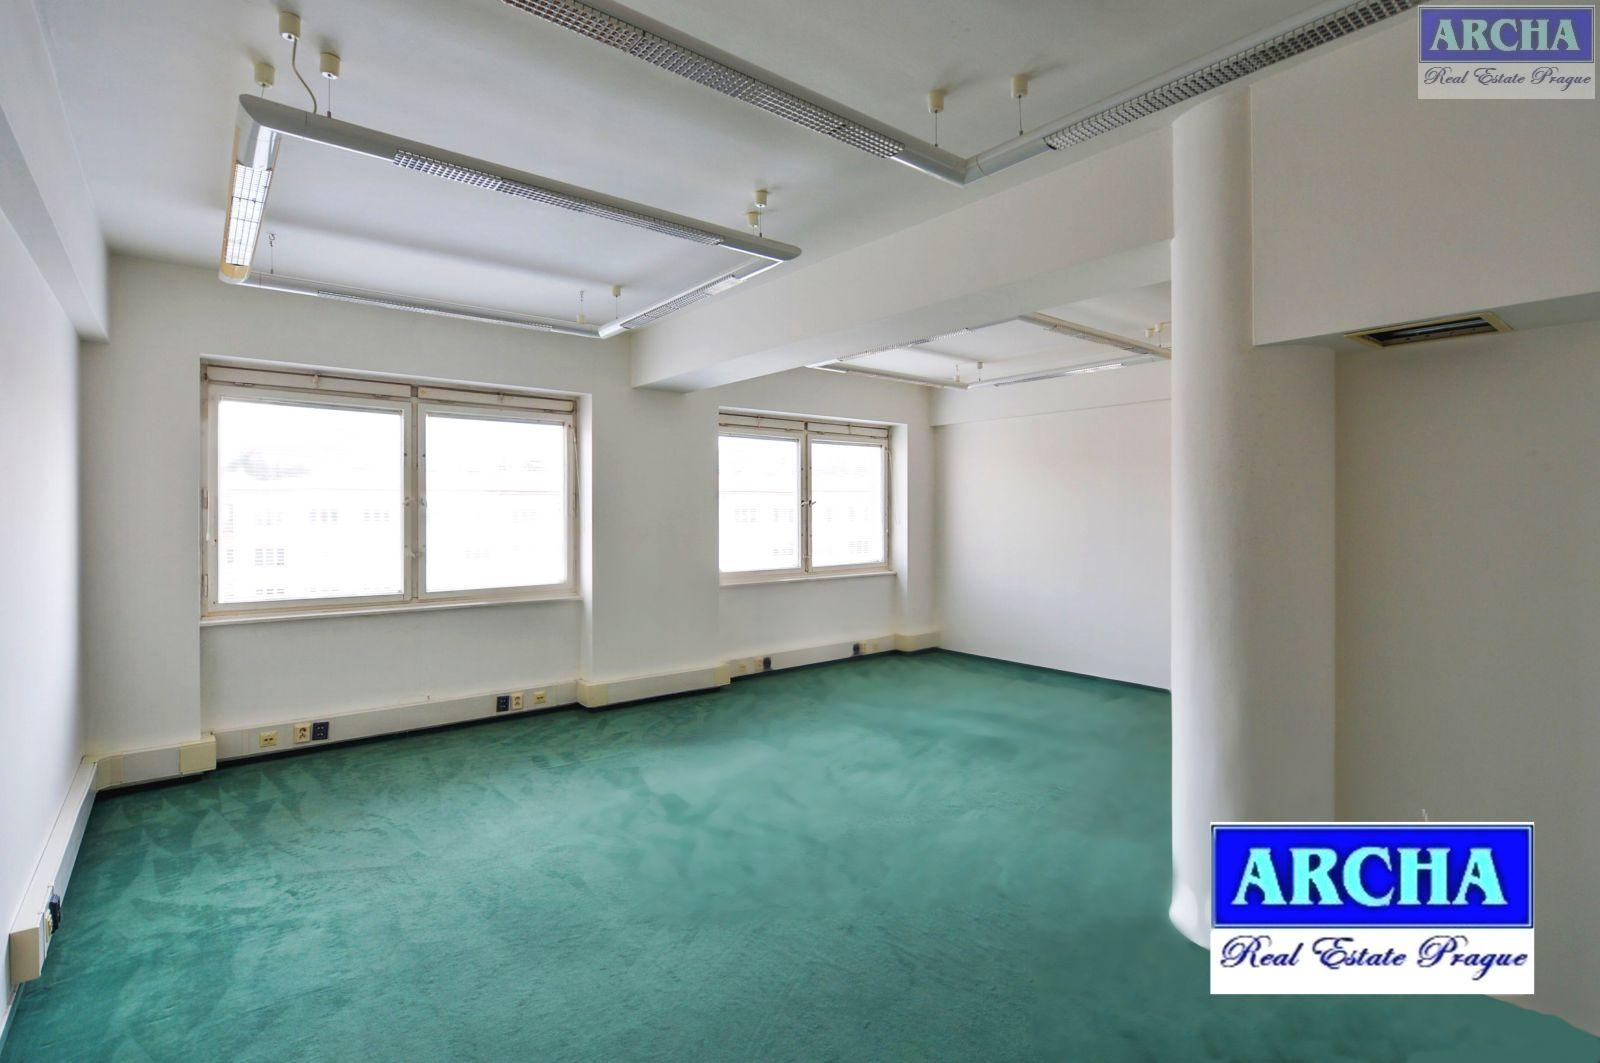 Nájem kancelářských ploch 162 m2, 4. patro, Litevská, Praha 10